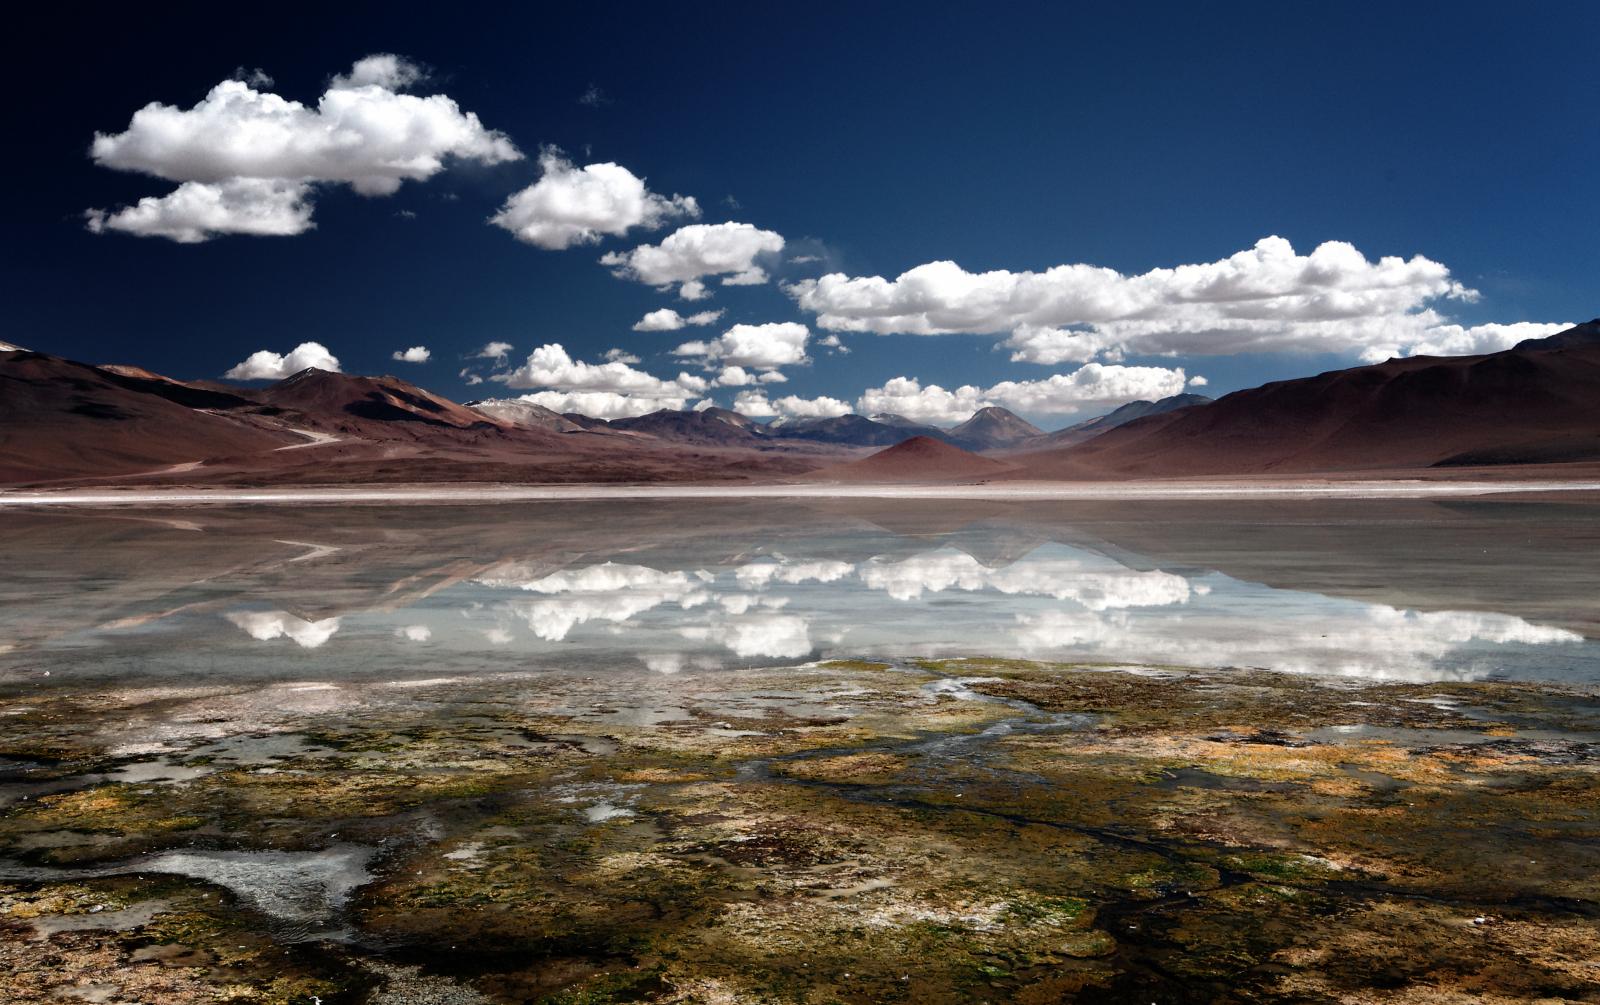 The Laguna Verde in southwestern Bolivia. By Mike Green.